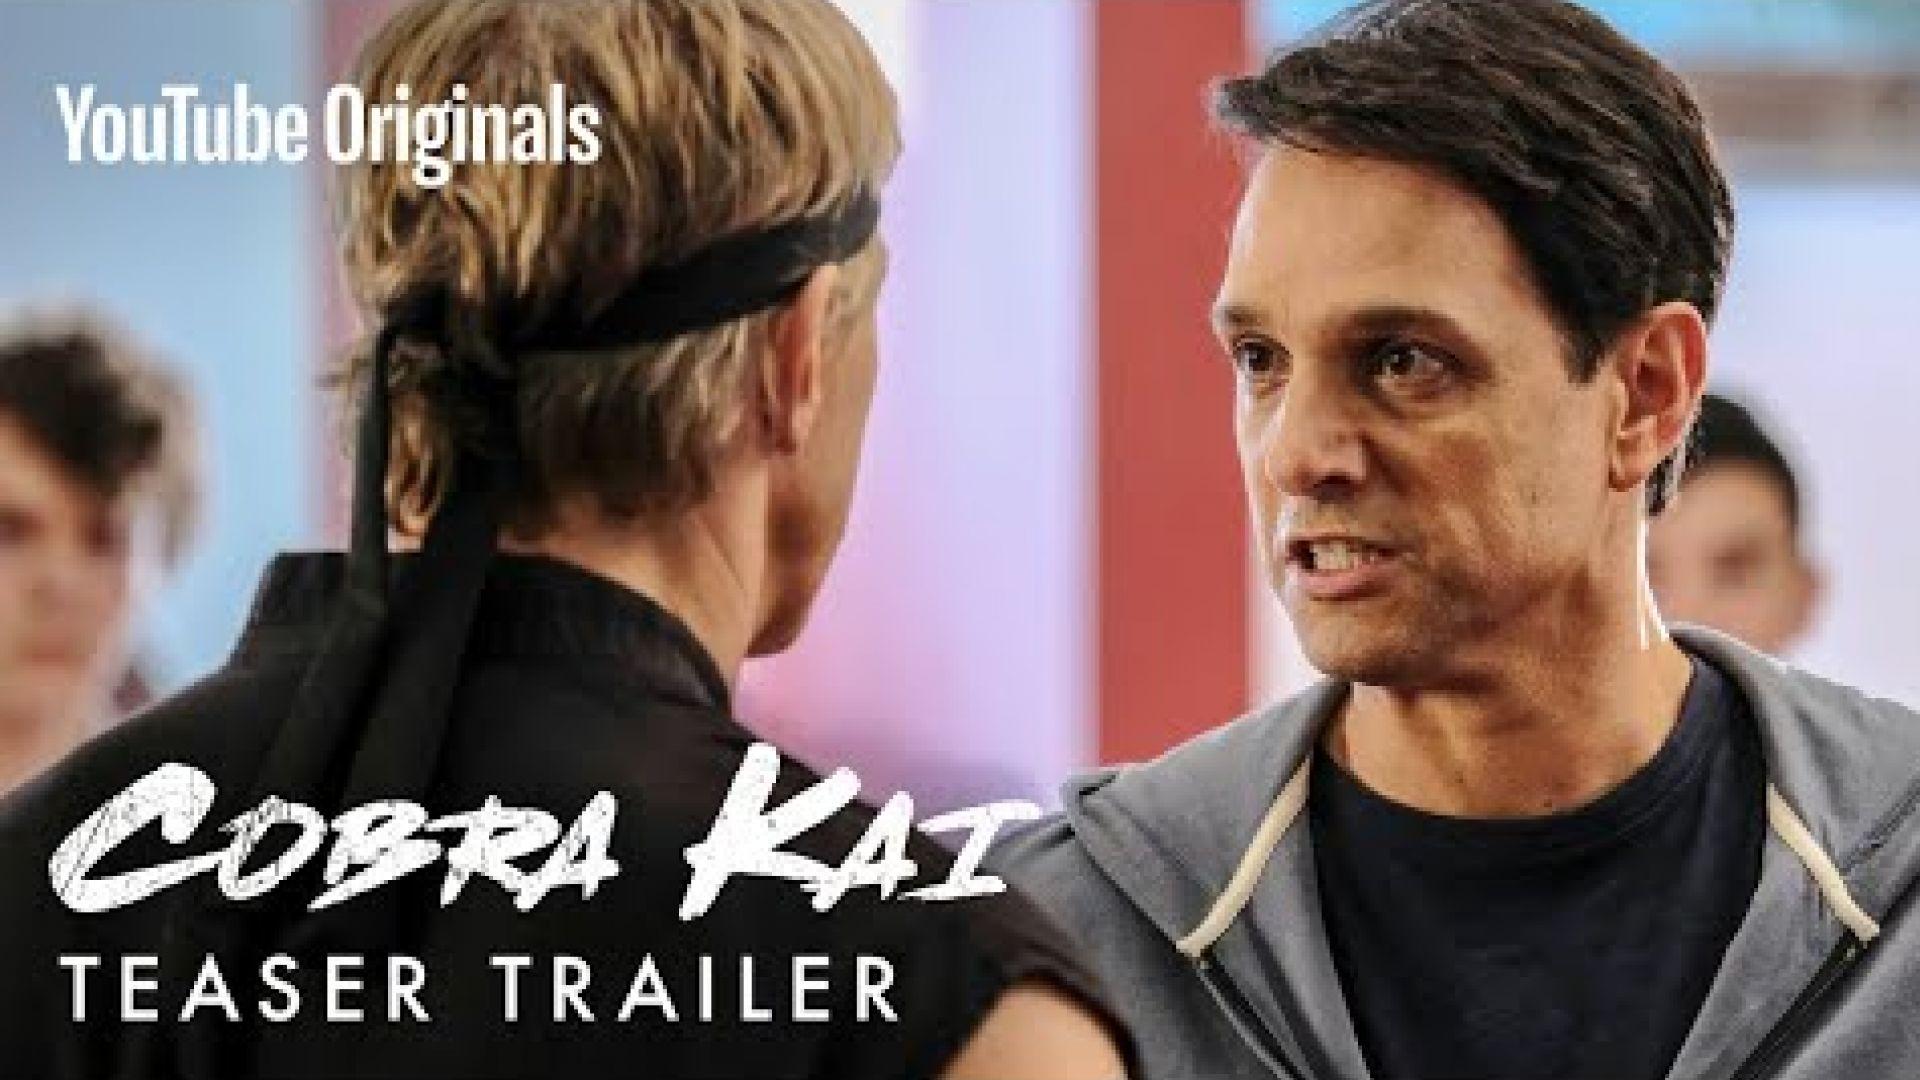 First Look 'Cobra Kai' Season Teaser